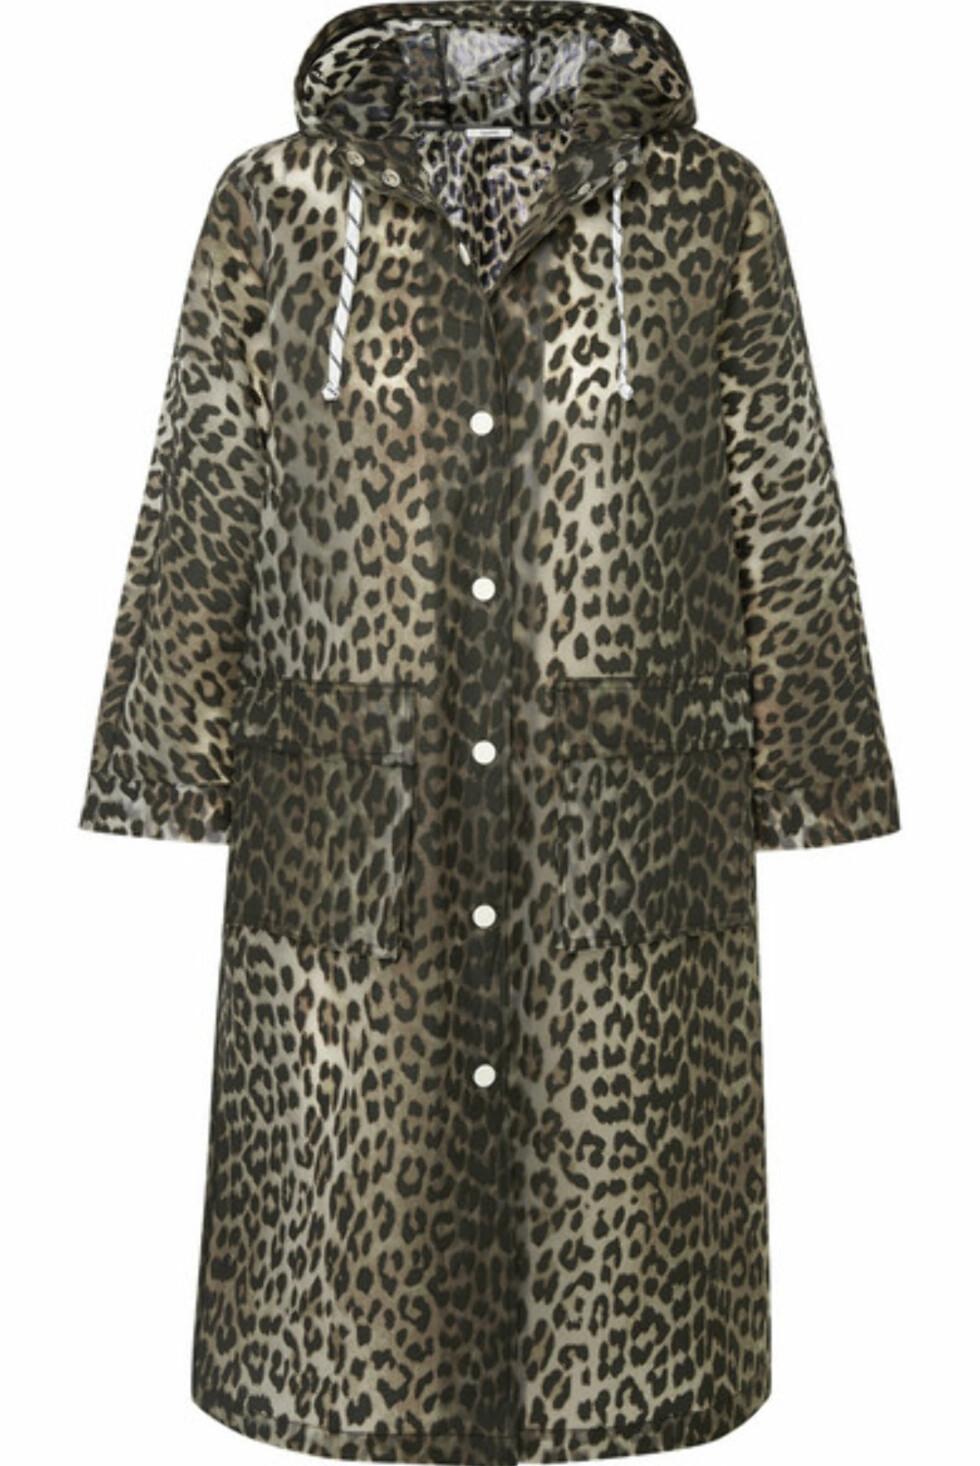 Jakke fra Ganni  2840,-  https://www.net-a-porter.com/no/en/product/1056932/ganni/leopard-print-matte-pu-coat